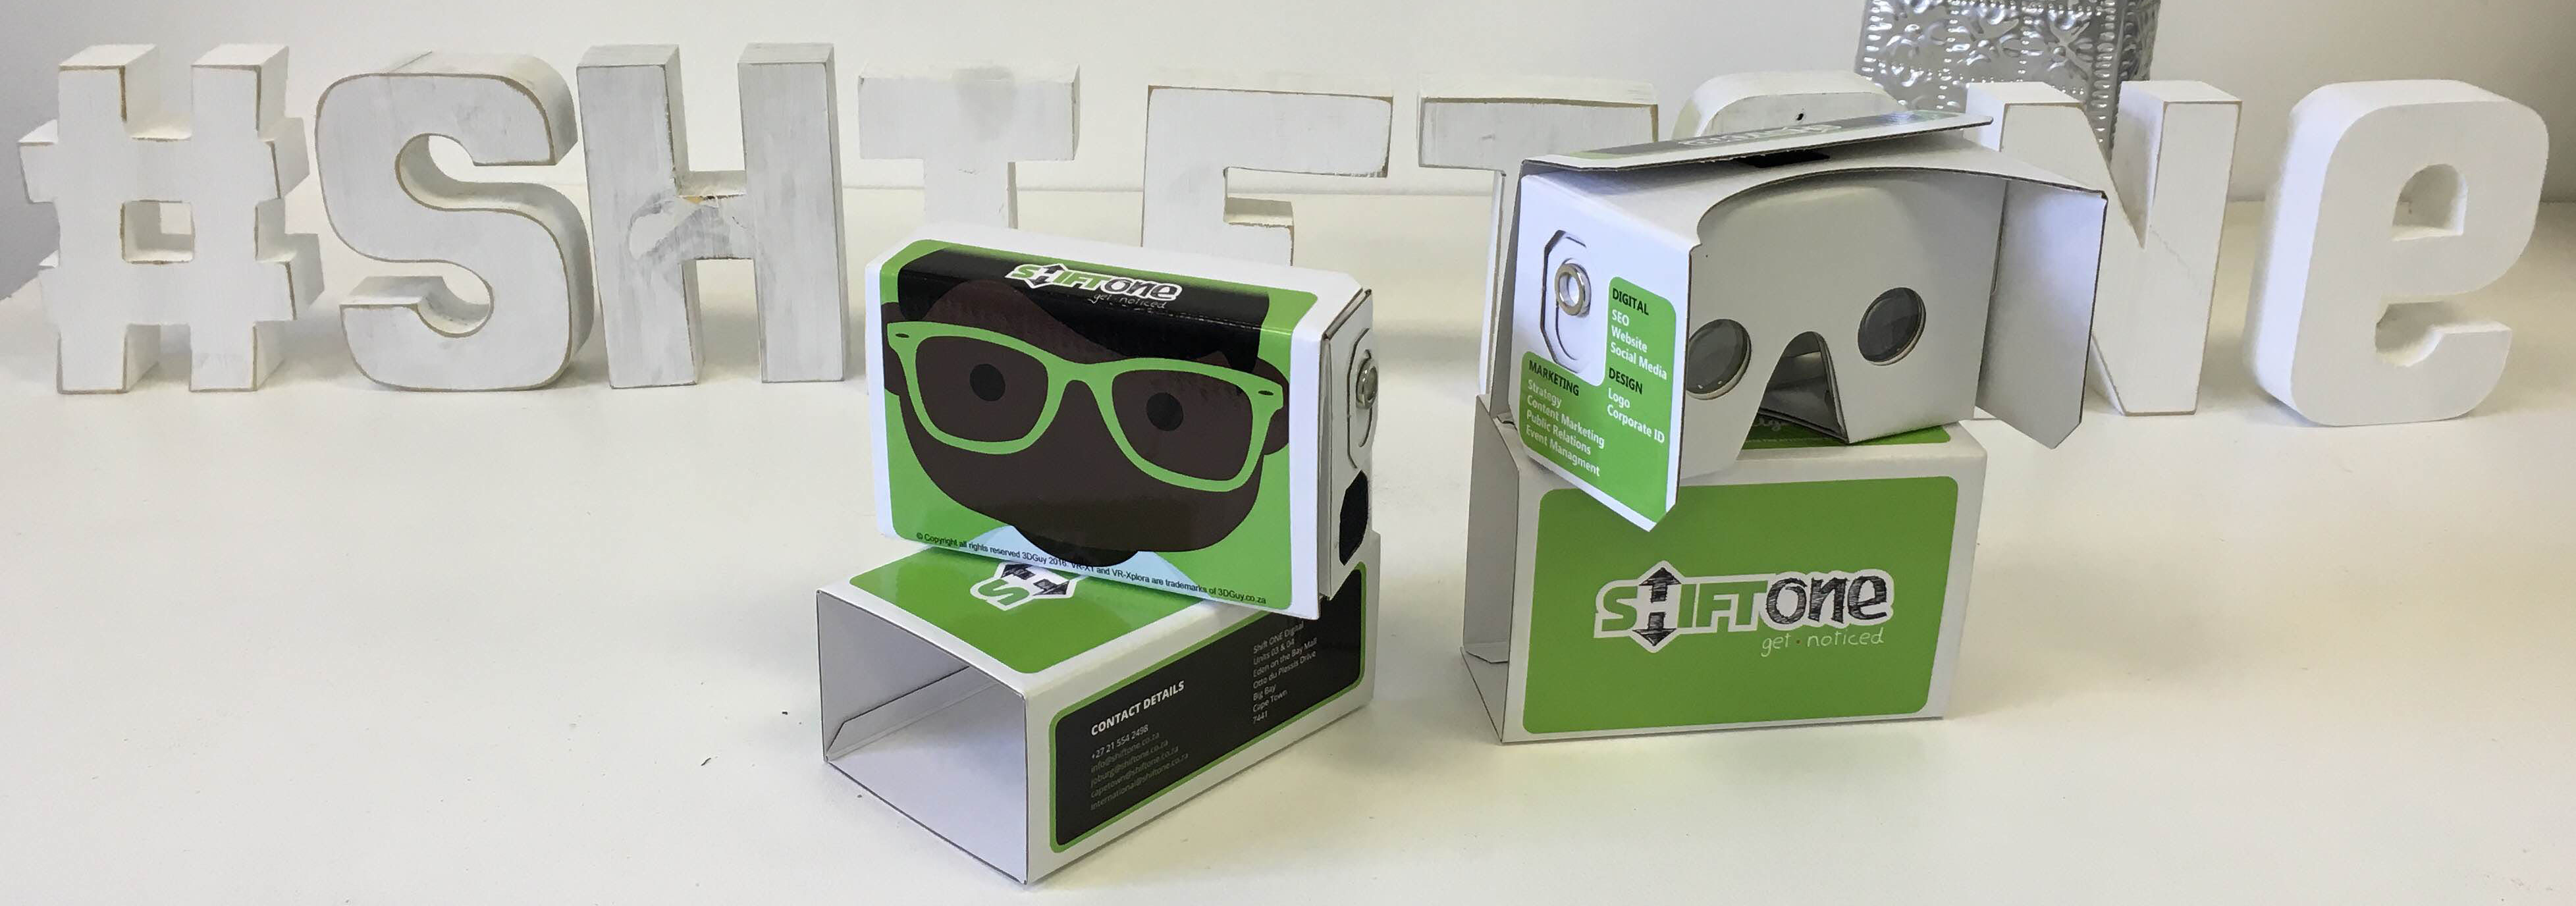 Buy Google Cardboard South Africa